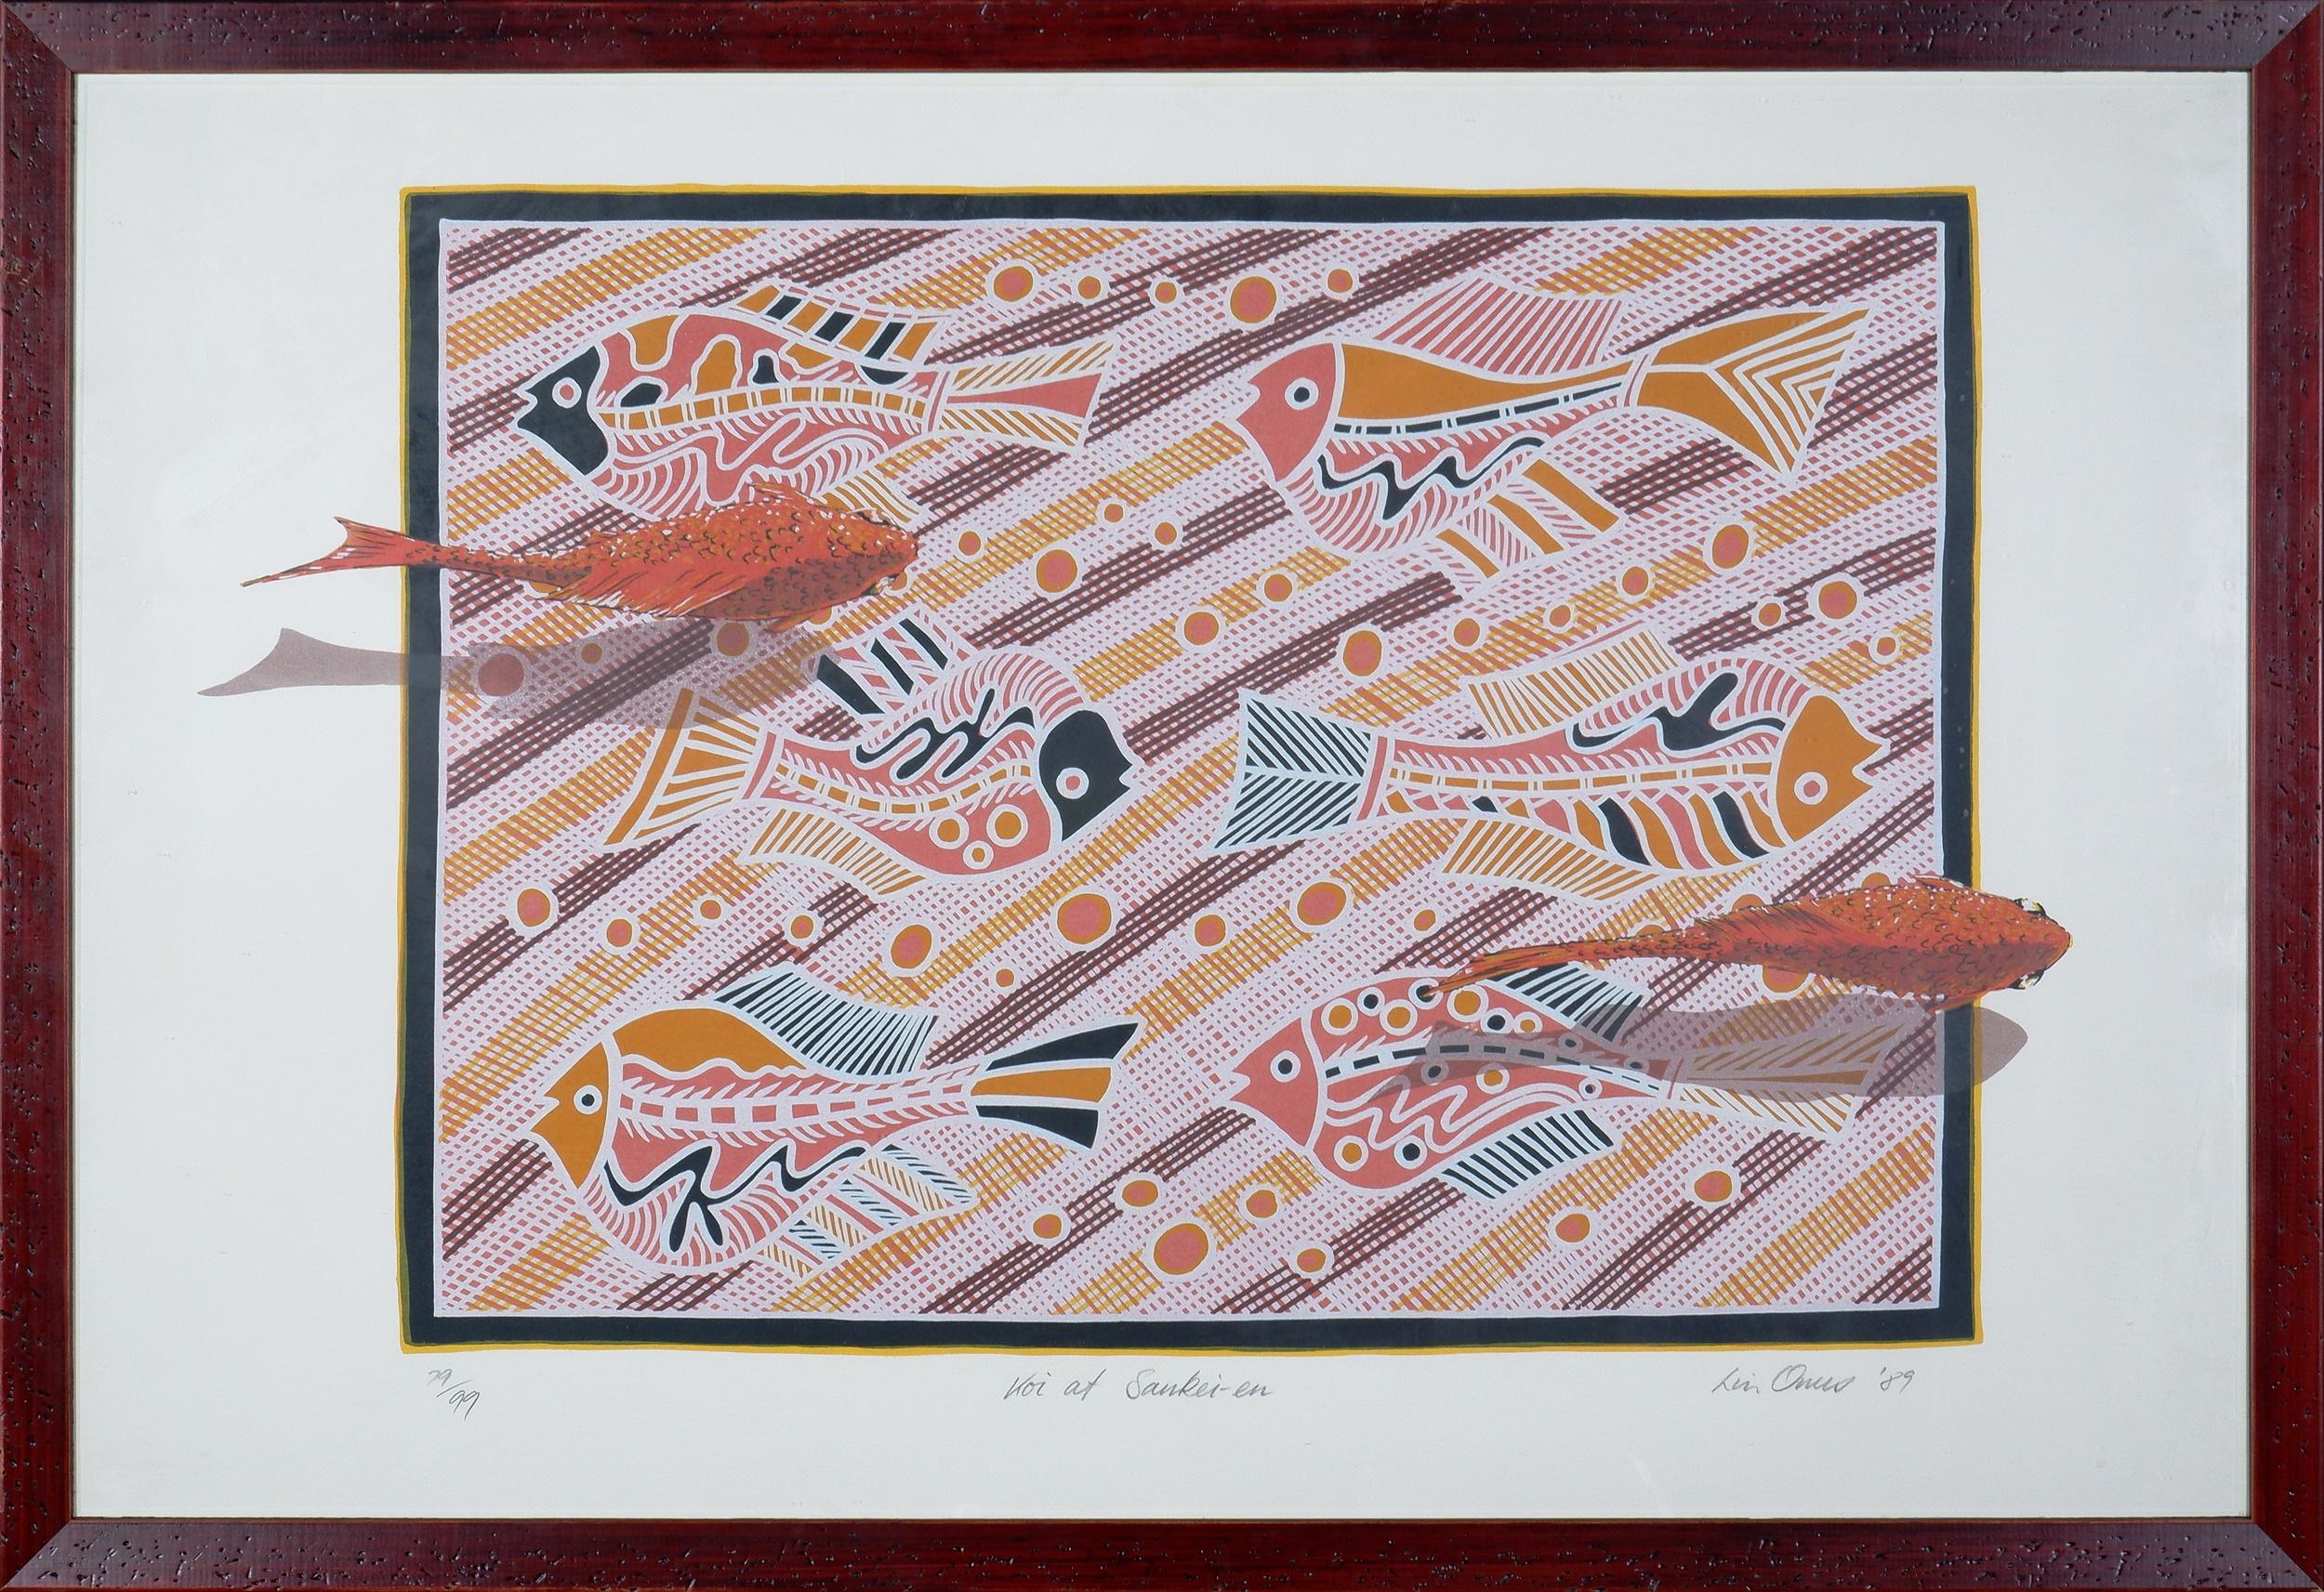 'Lin Onus (1948-1996 Yorta Yorta language group), Koi at Sankei-En 1989, Screenprint, 50 x 70 cm  (image size)'